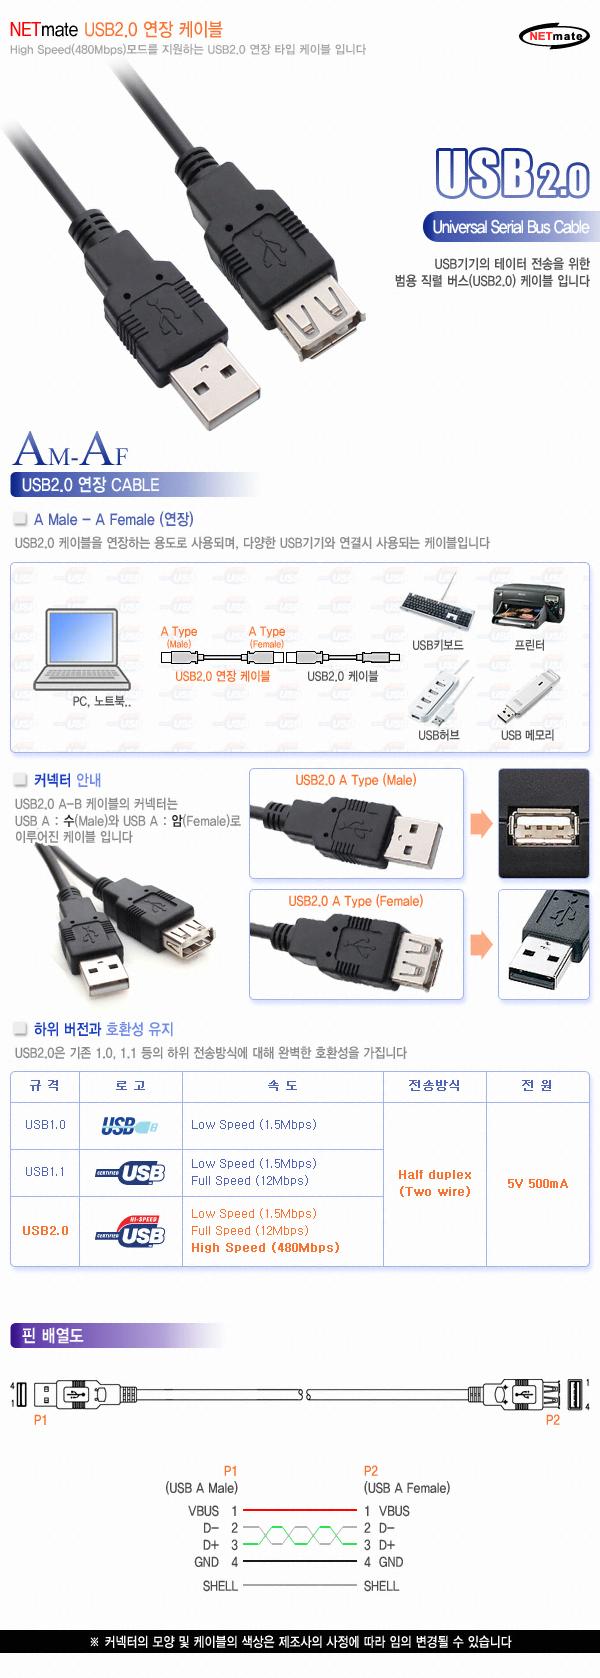 USB20_MF_BK_01.jpg